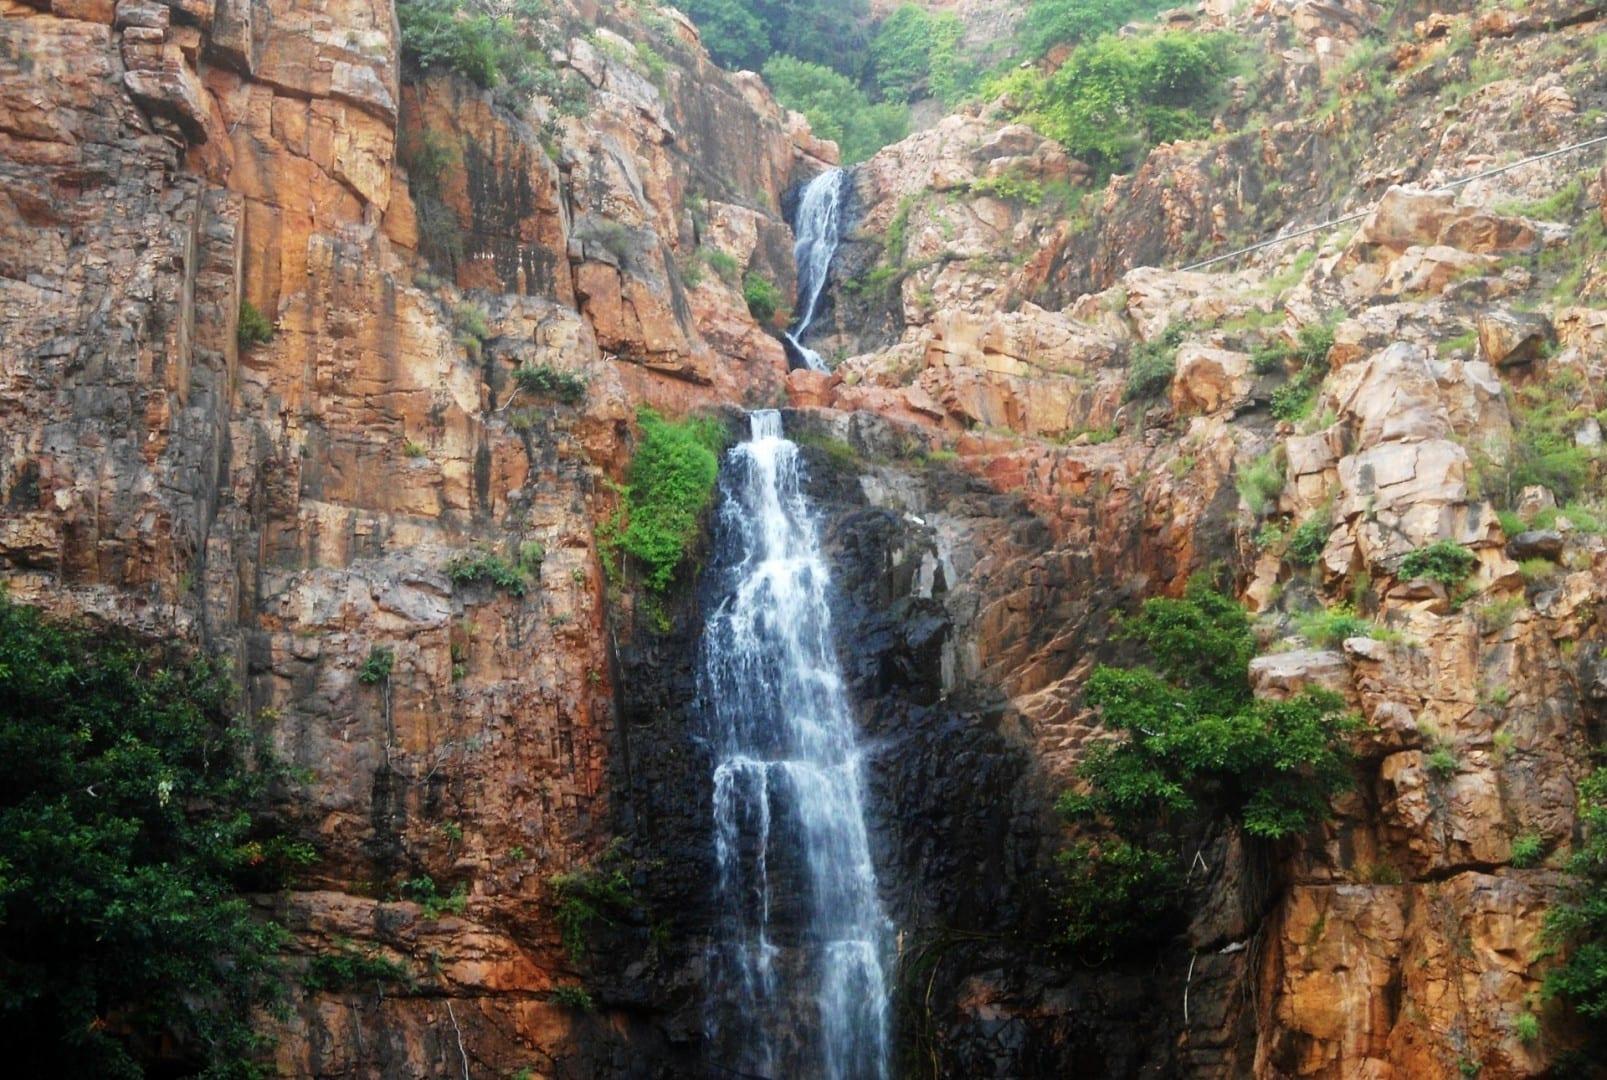 La arenisca de las rocas de cuarzo de detrito en Kapilatheertham Tirupati India